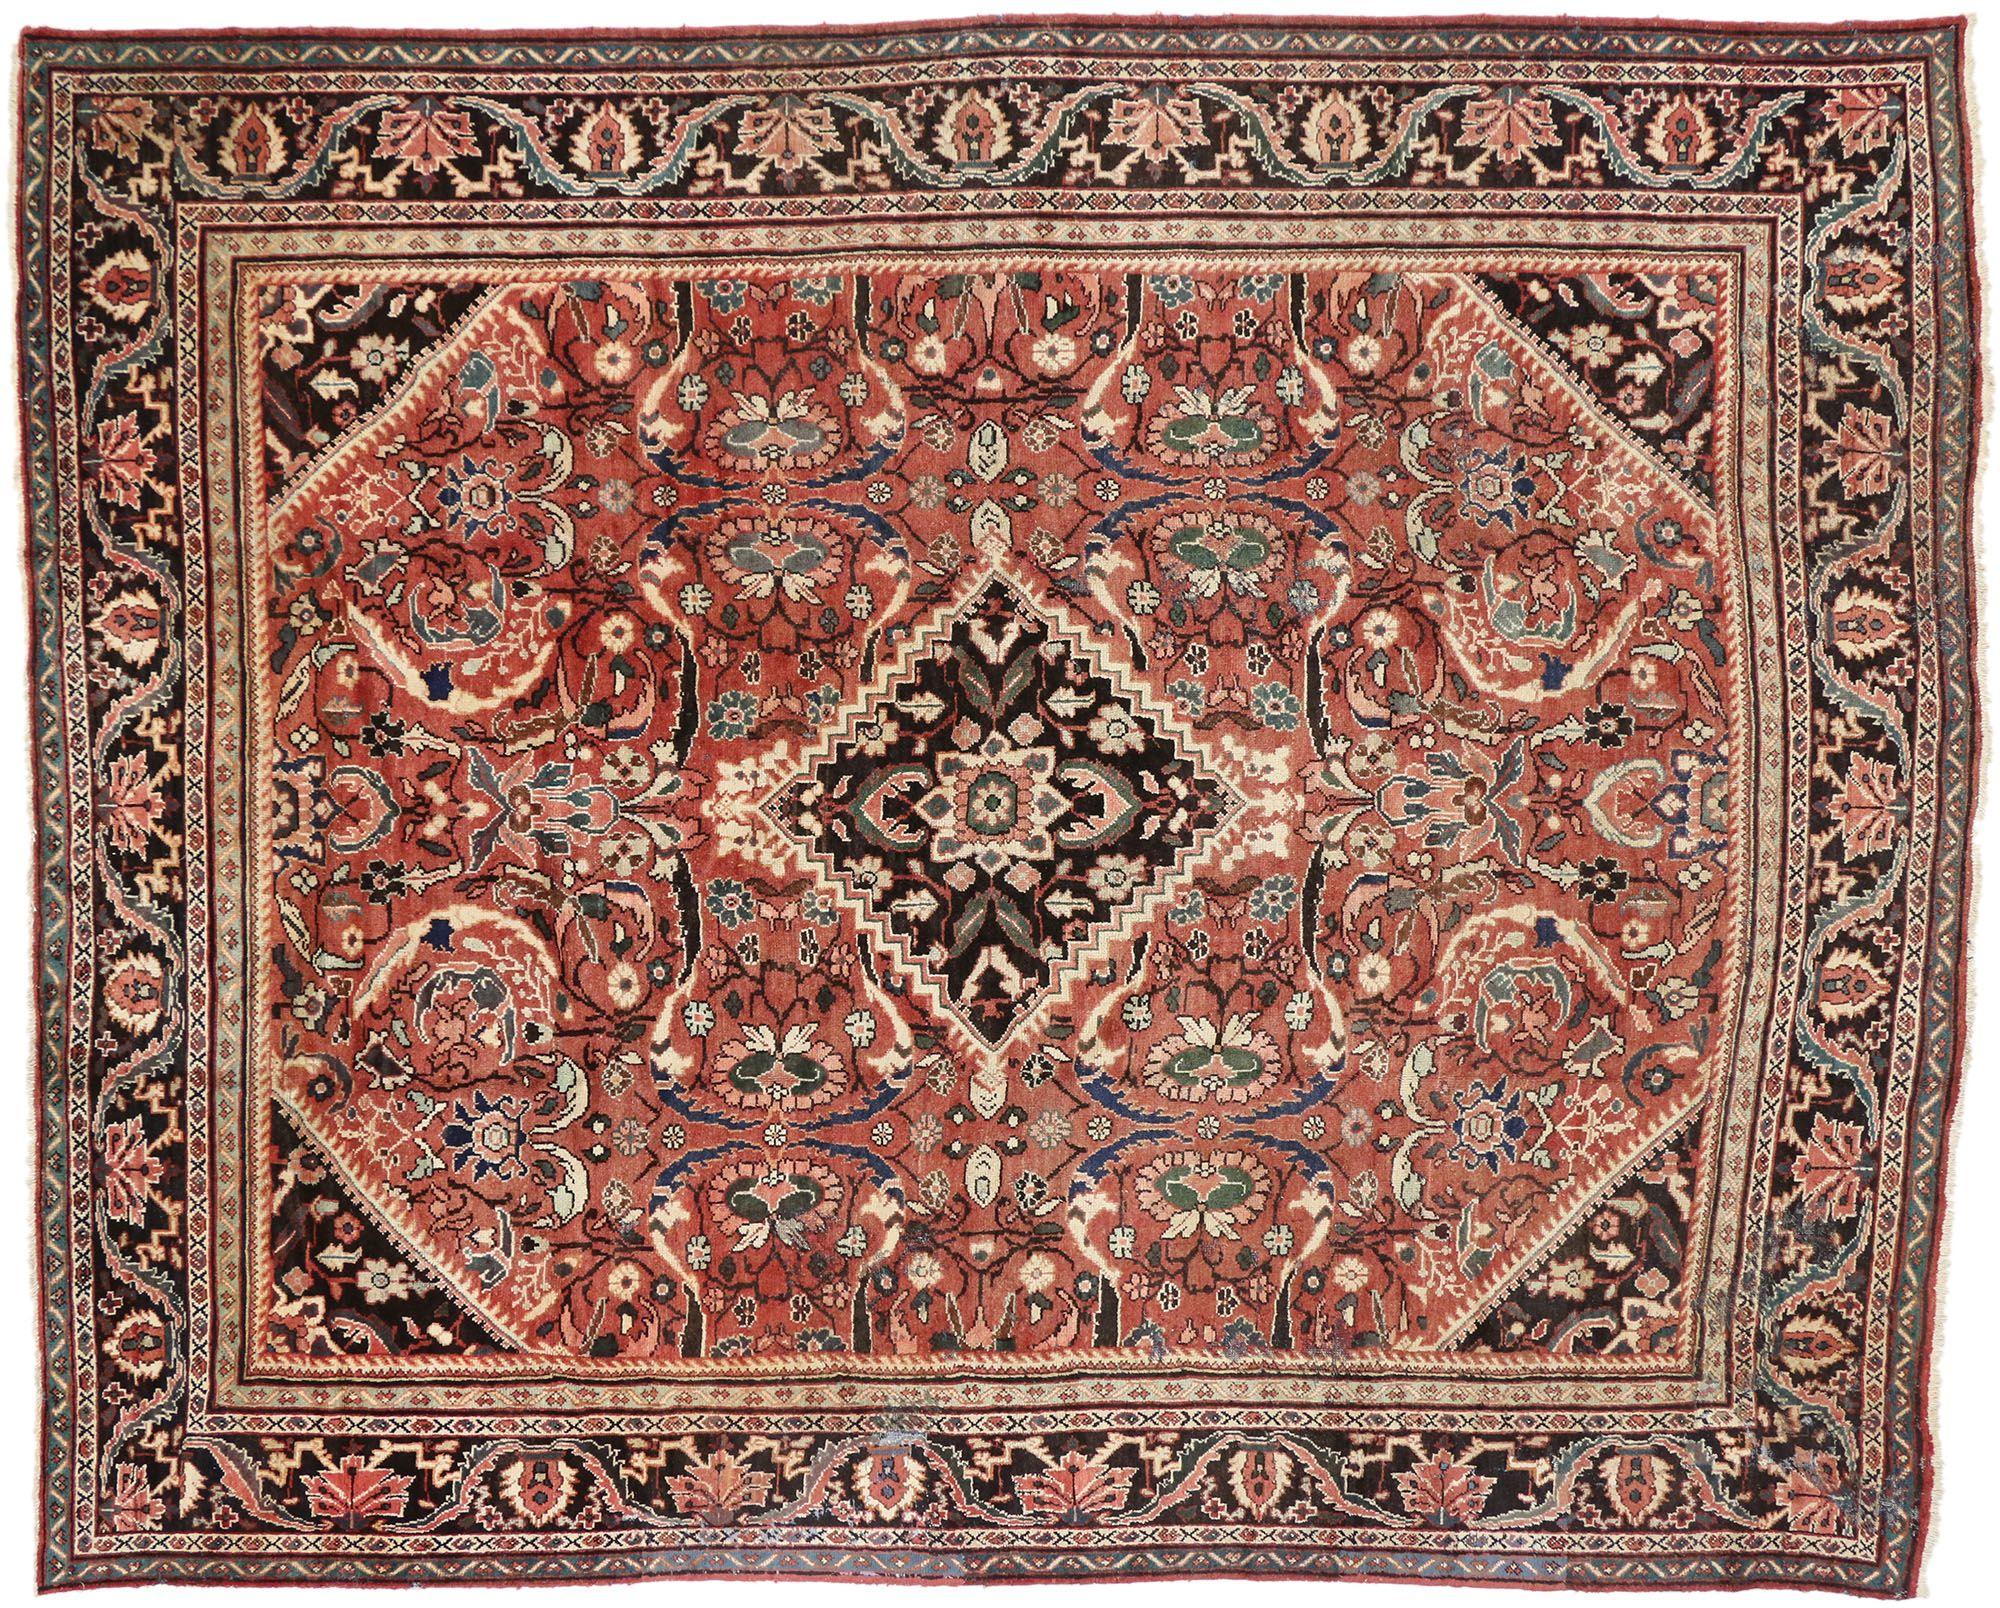 11 X 13 Vintage Persian Mahal Rug 74573 Vintage Persian Rug Rugs Rustic Luxe 11 x 13 area rugs